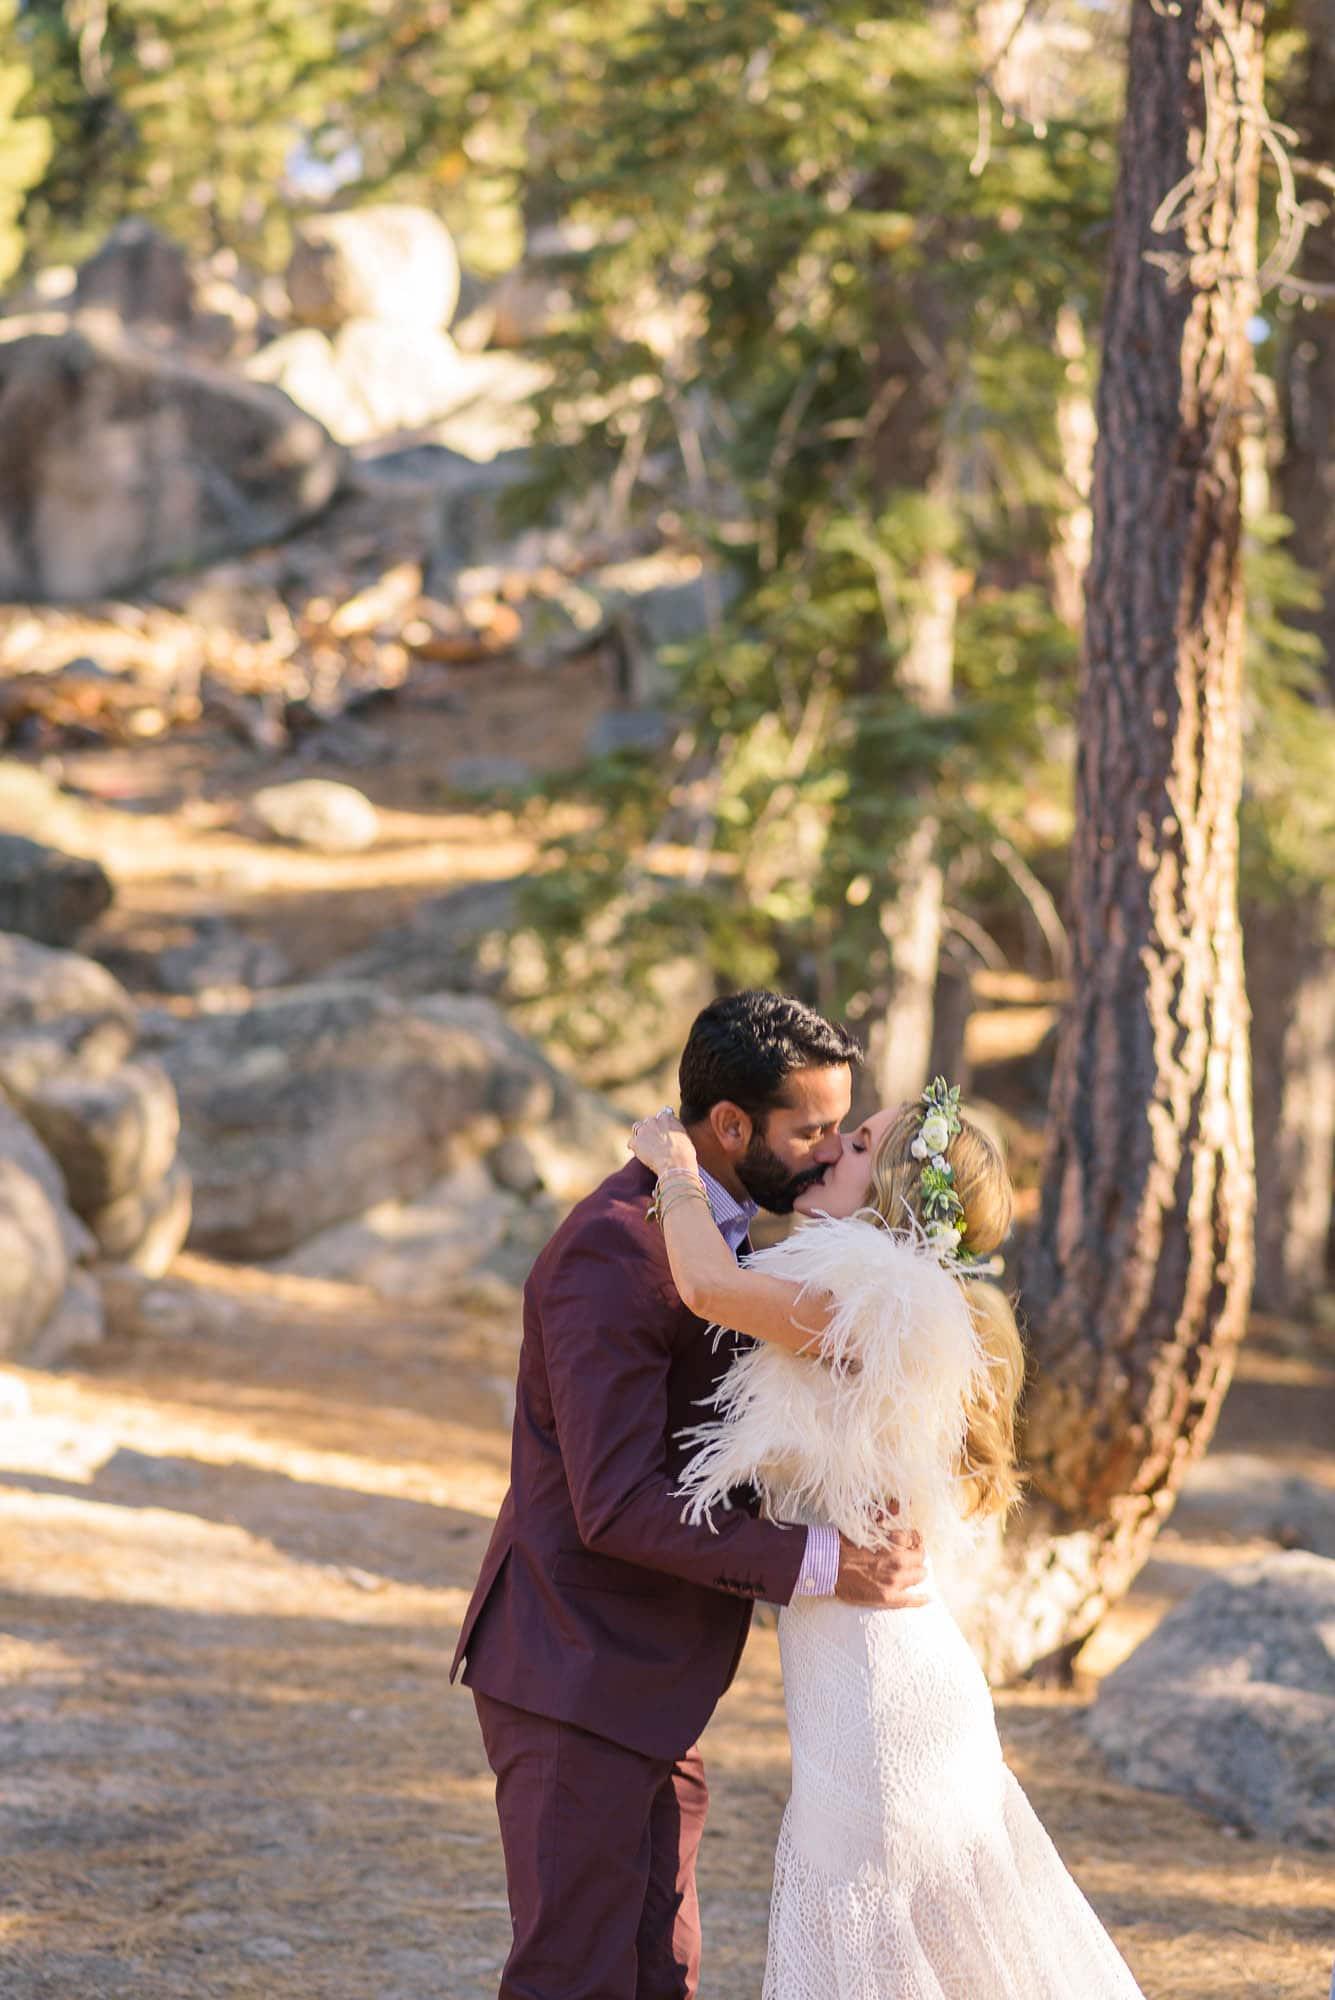 028_Alan_and_Heidi_Wedding_Natalie_Mike